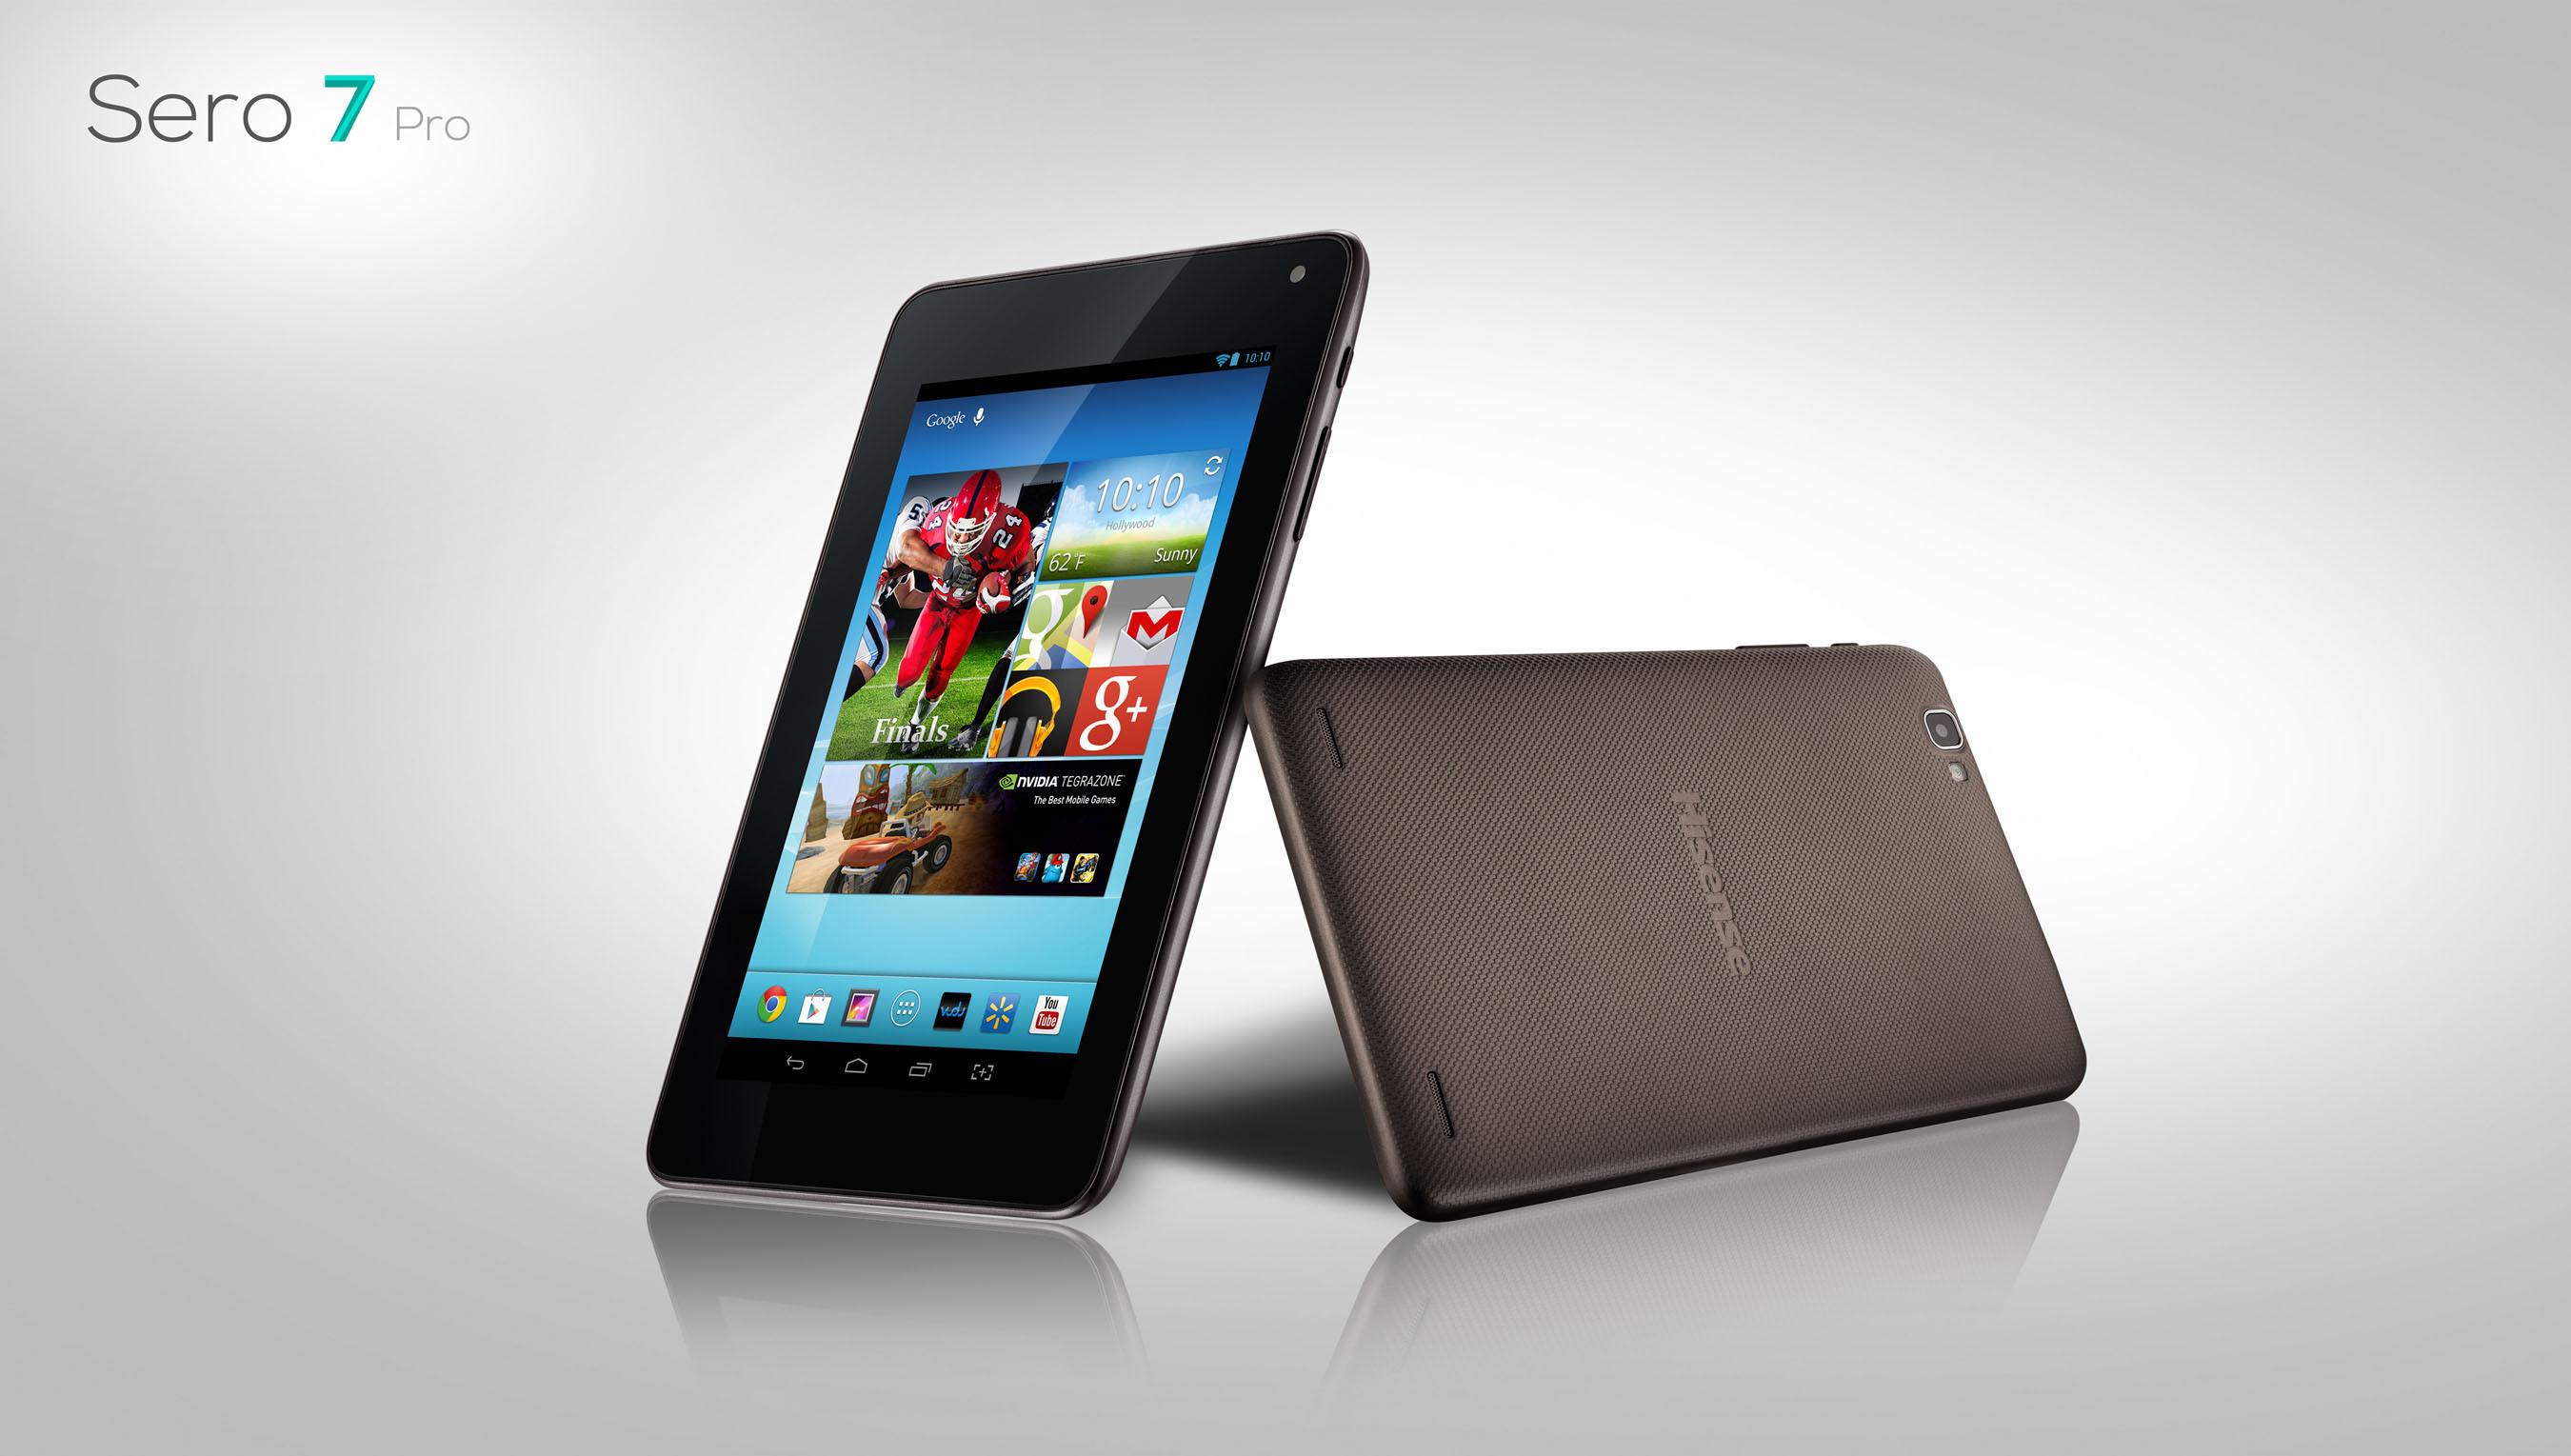 HiSense Sero 7 PRO 7inch Tablet mit HD-Display & Tegra 3 Quadcore für 149 Dollar bei Wal-Mart